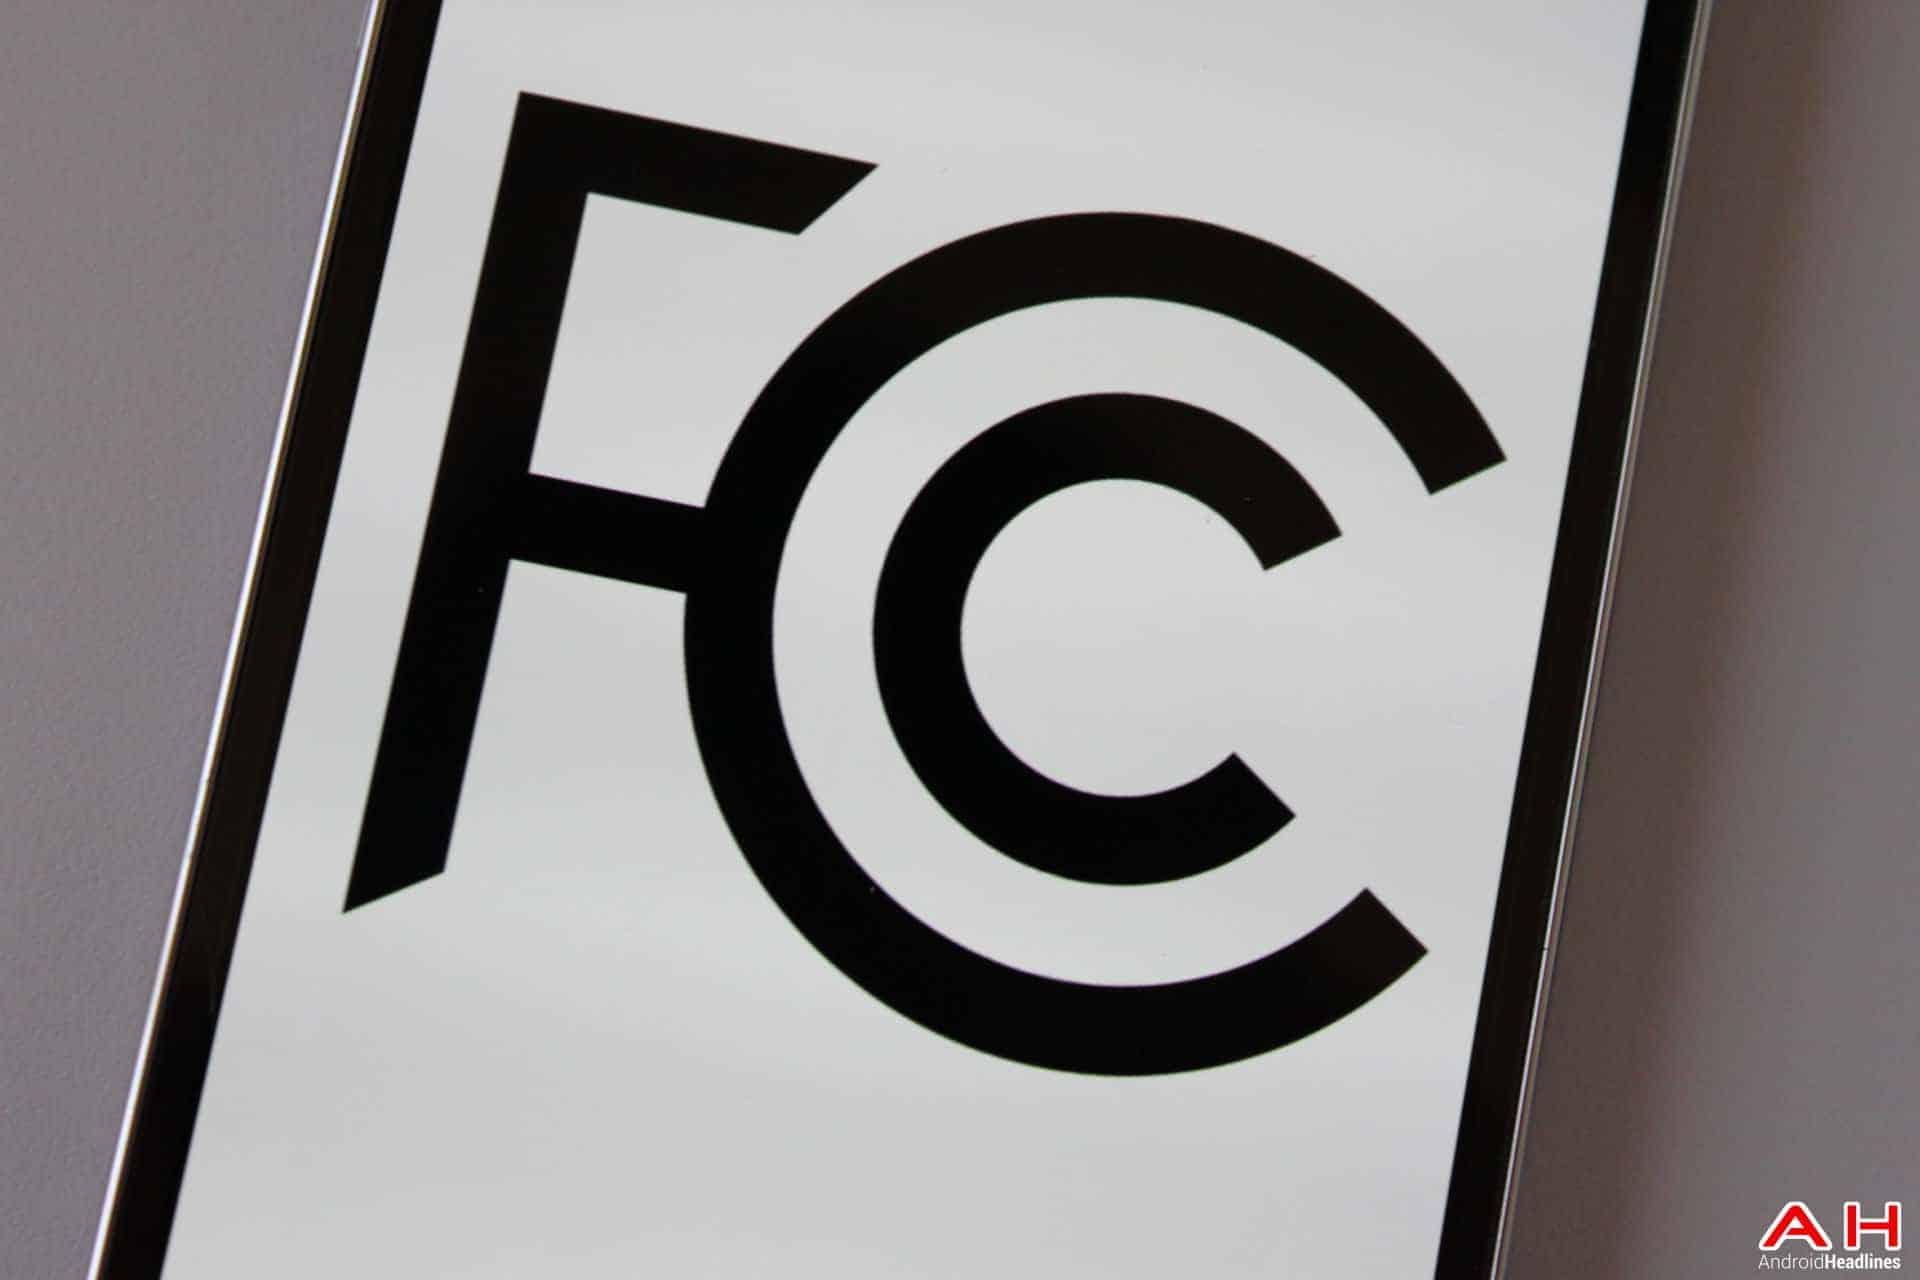 AH FCC LOGO 3